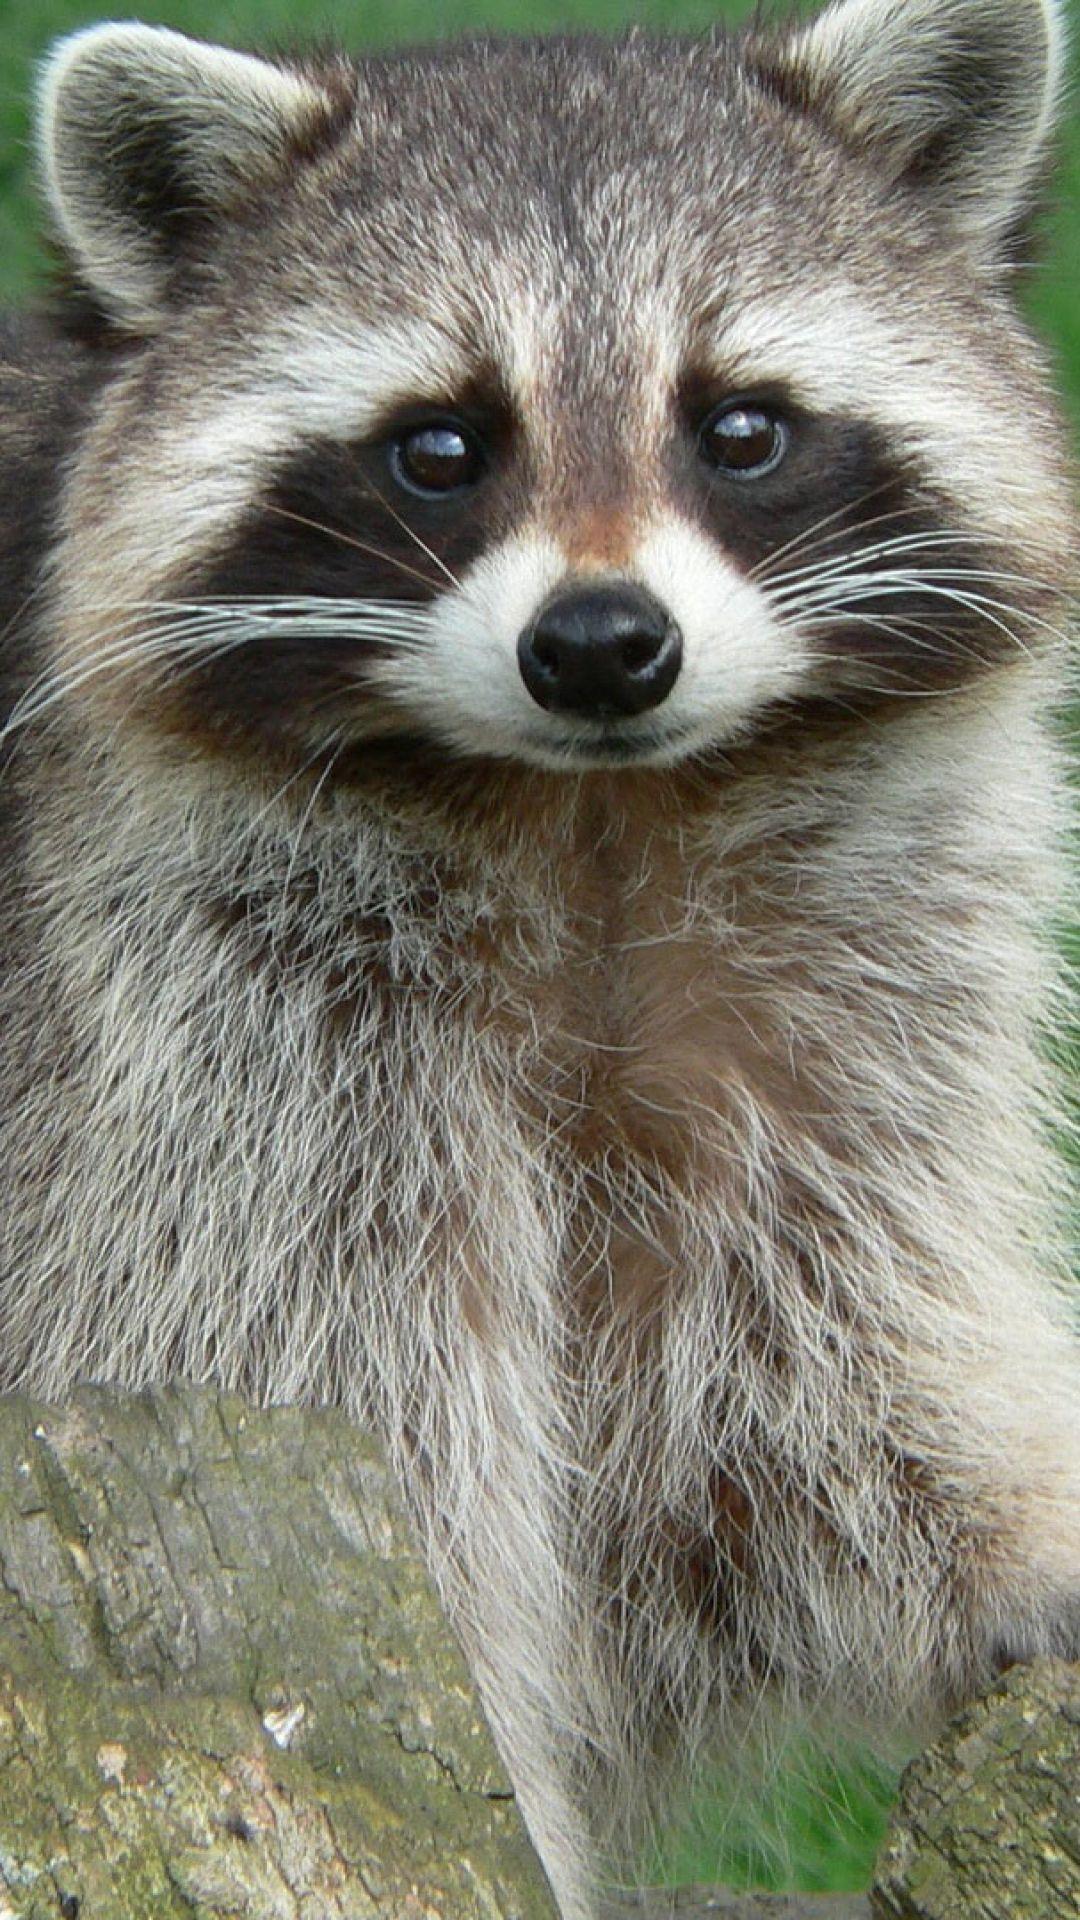 *Smiley face raccoon. (sp) raccoon animals wildlife